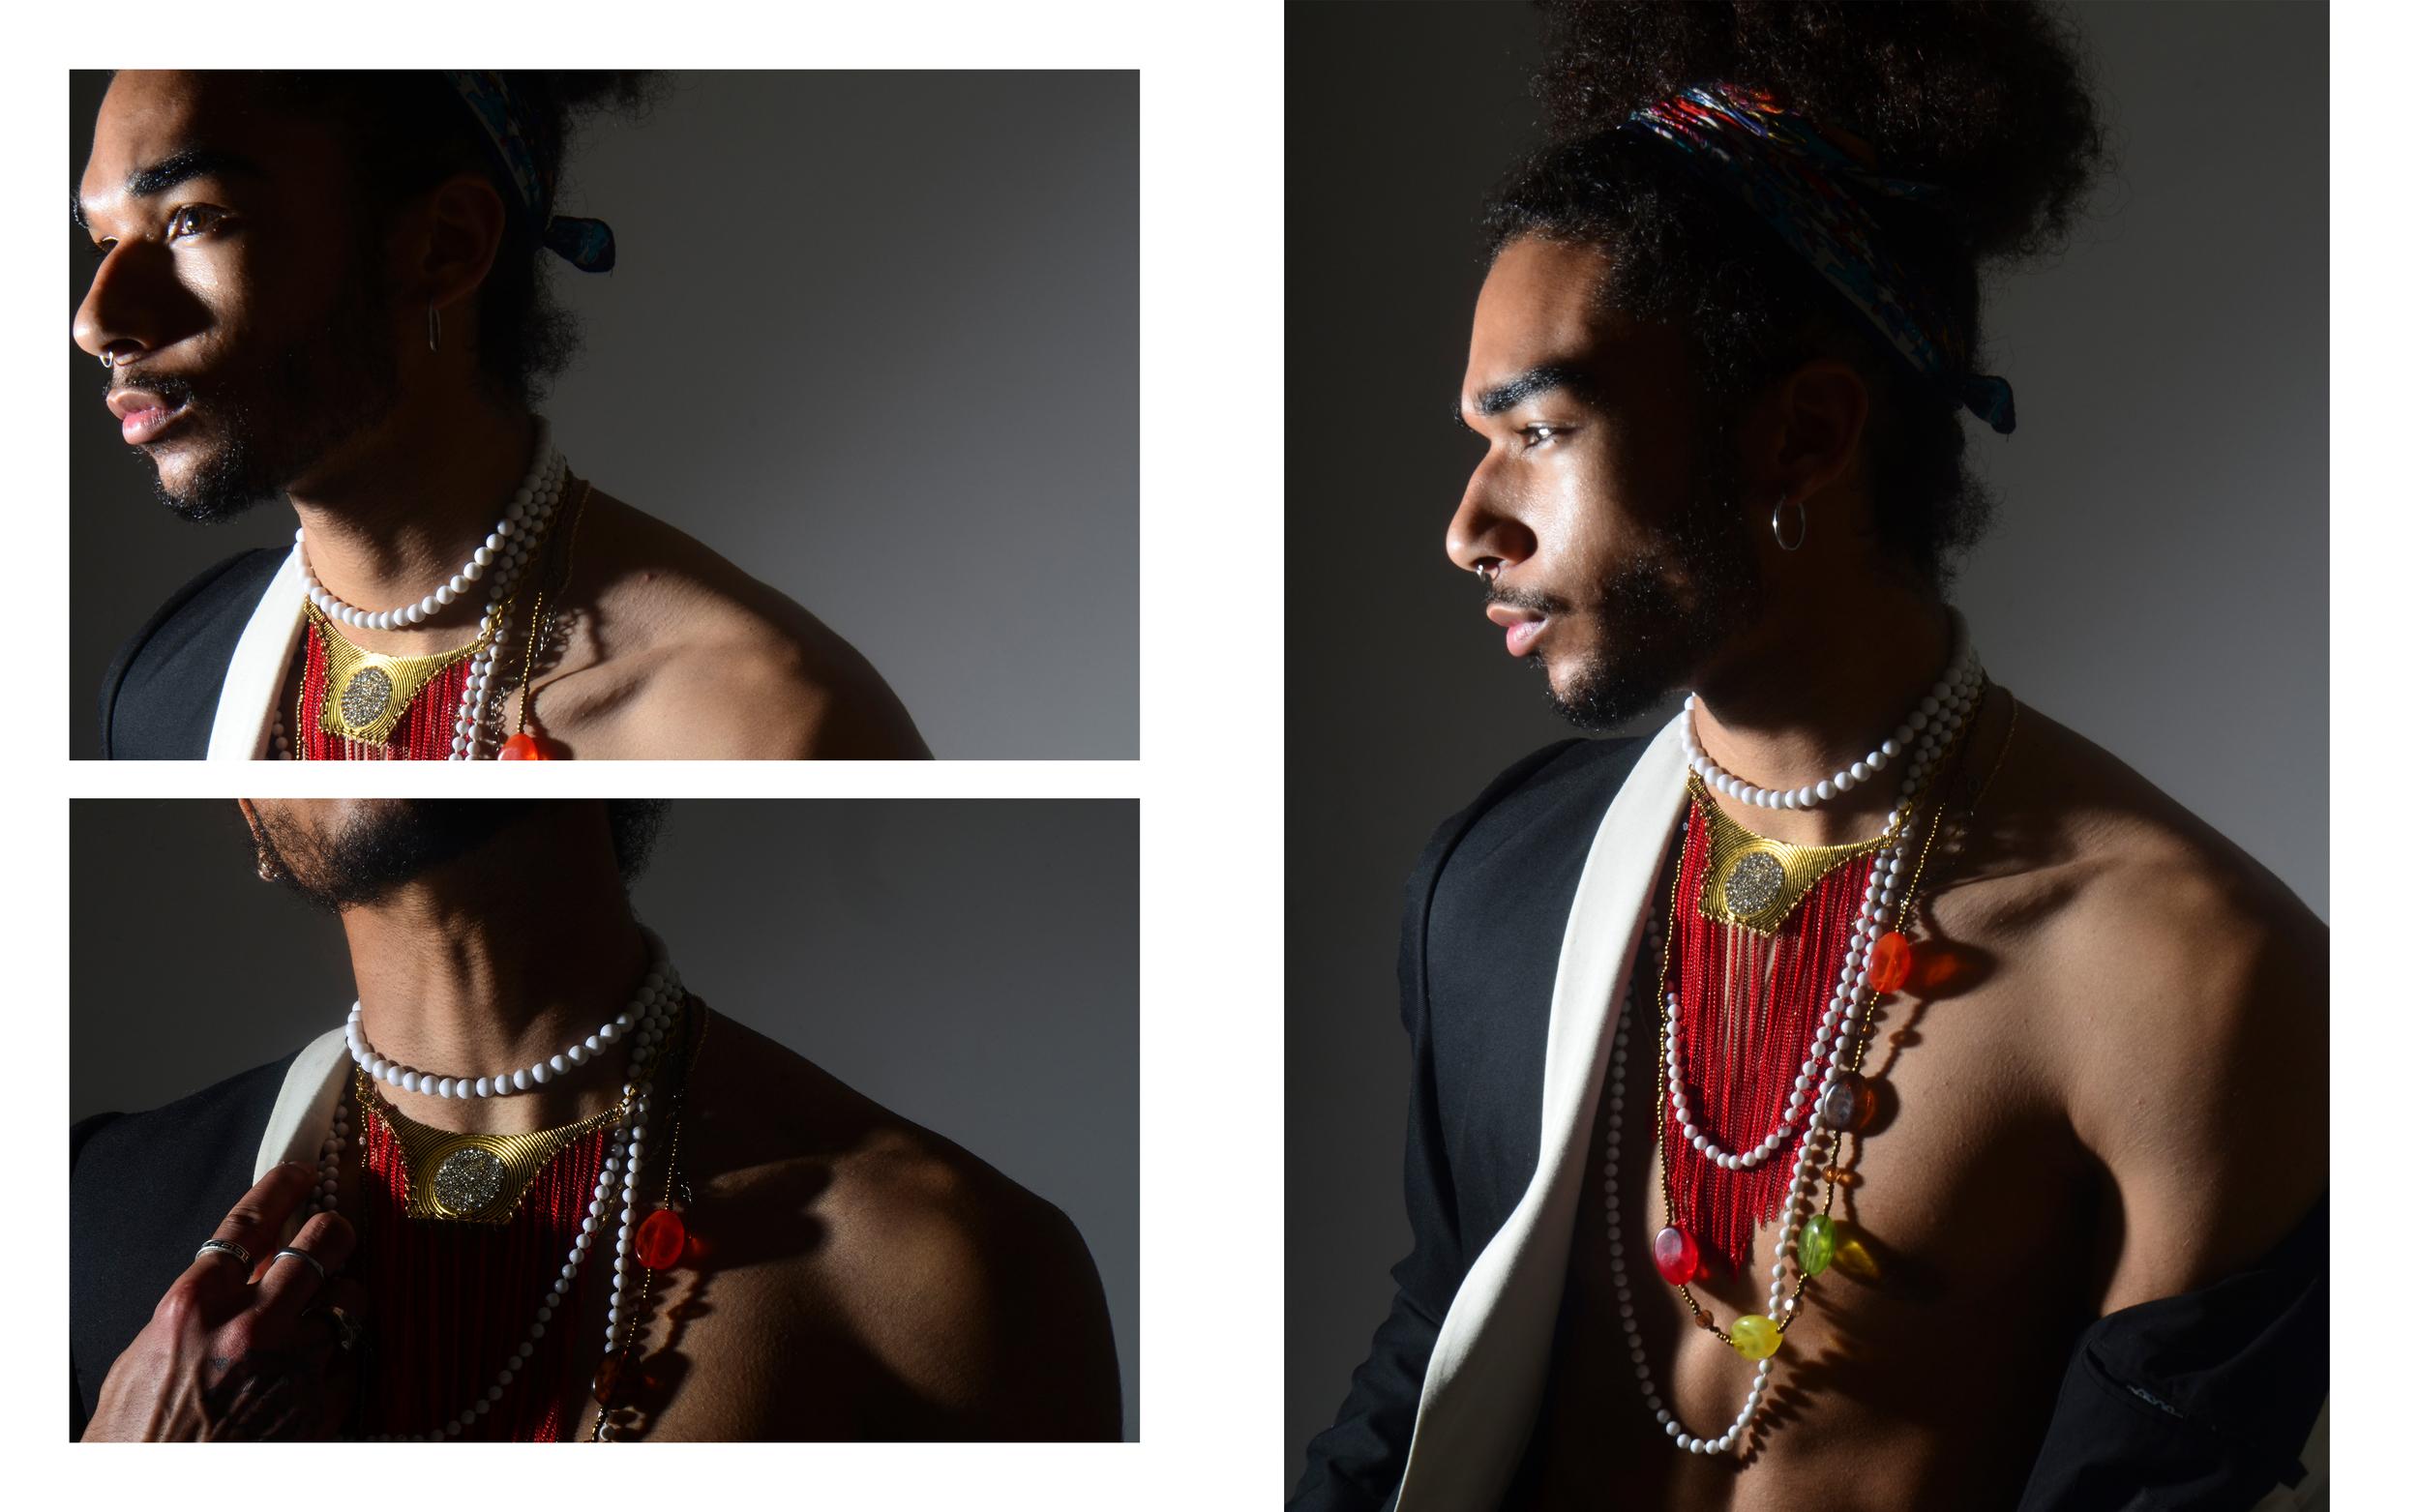 Blazer | ASOS ( asos.com ) - Jewelry | assortment from Amazon and Einstein's Attic ( Einstein's Attic )